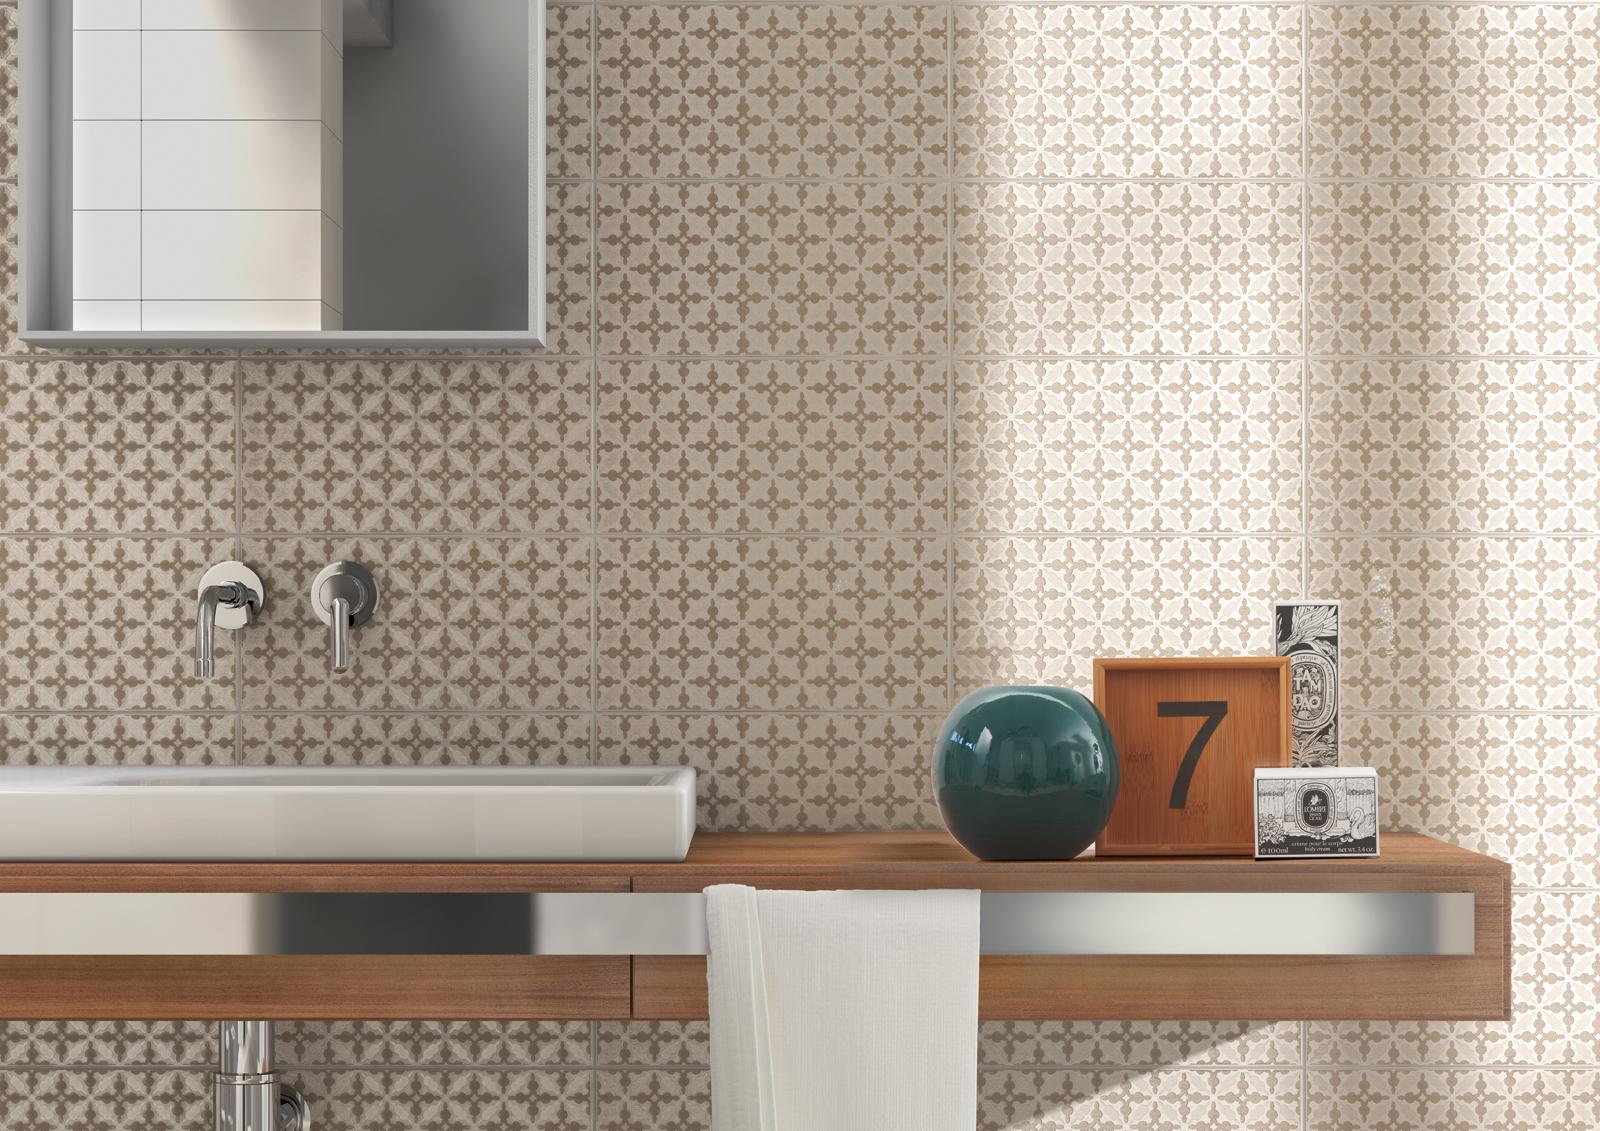 Covent Garden - Rivestimento bagno e cucina | Marazzi